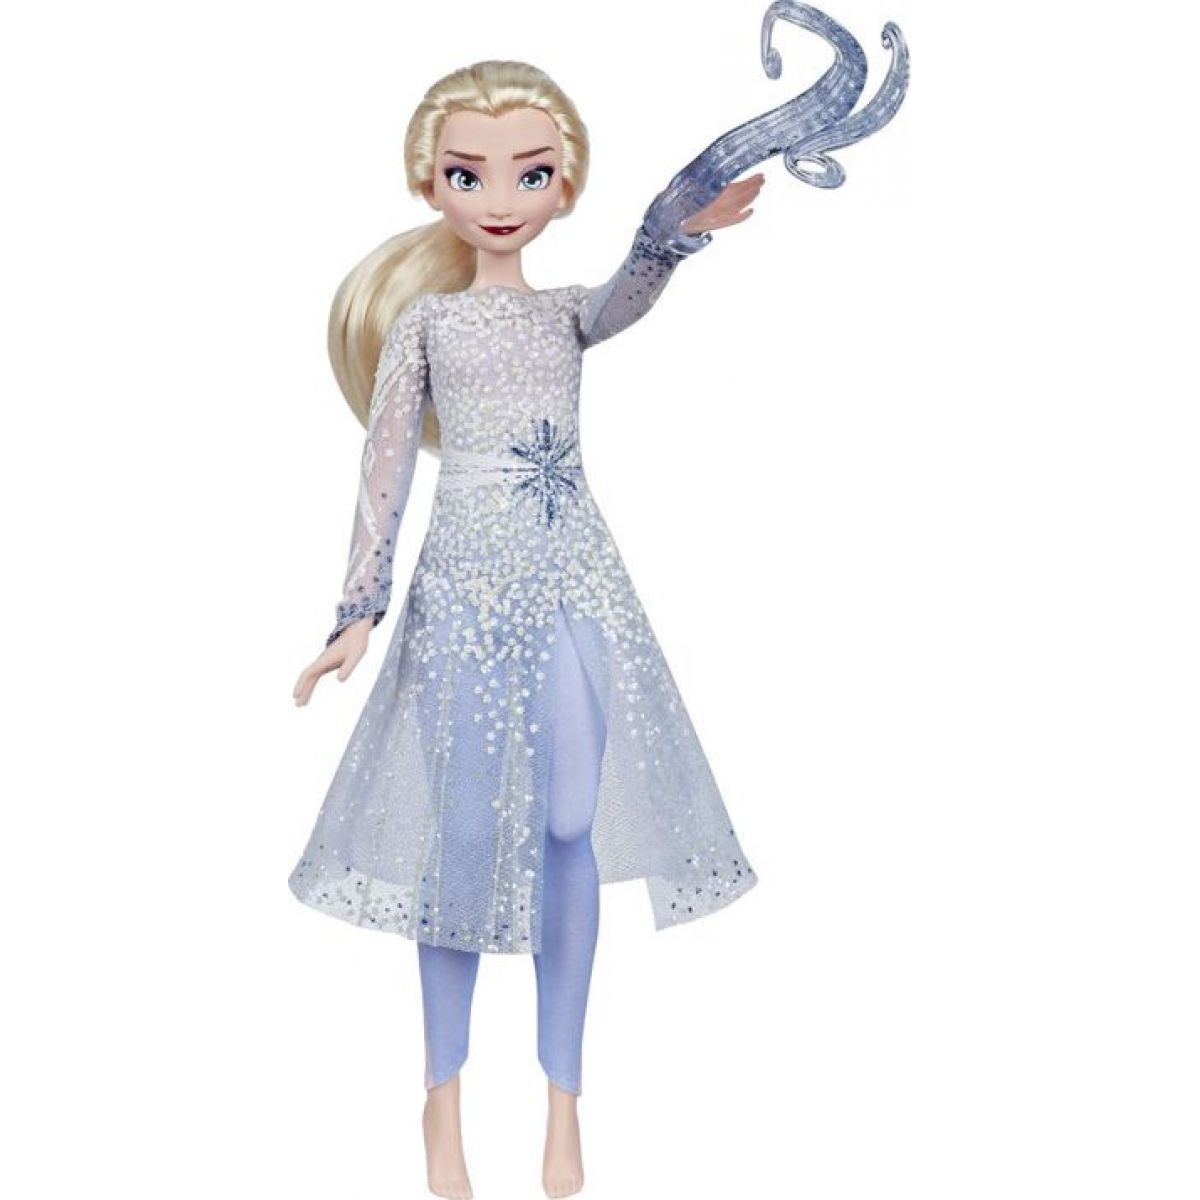 Hasbro Frozen 2 Kúzelné dobrodružstvo Elsa